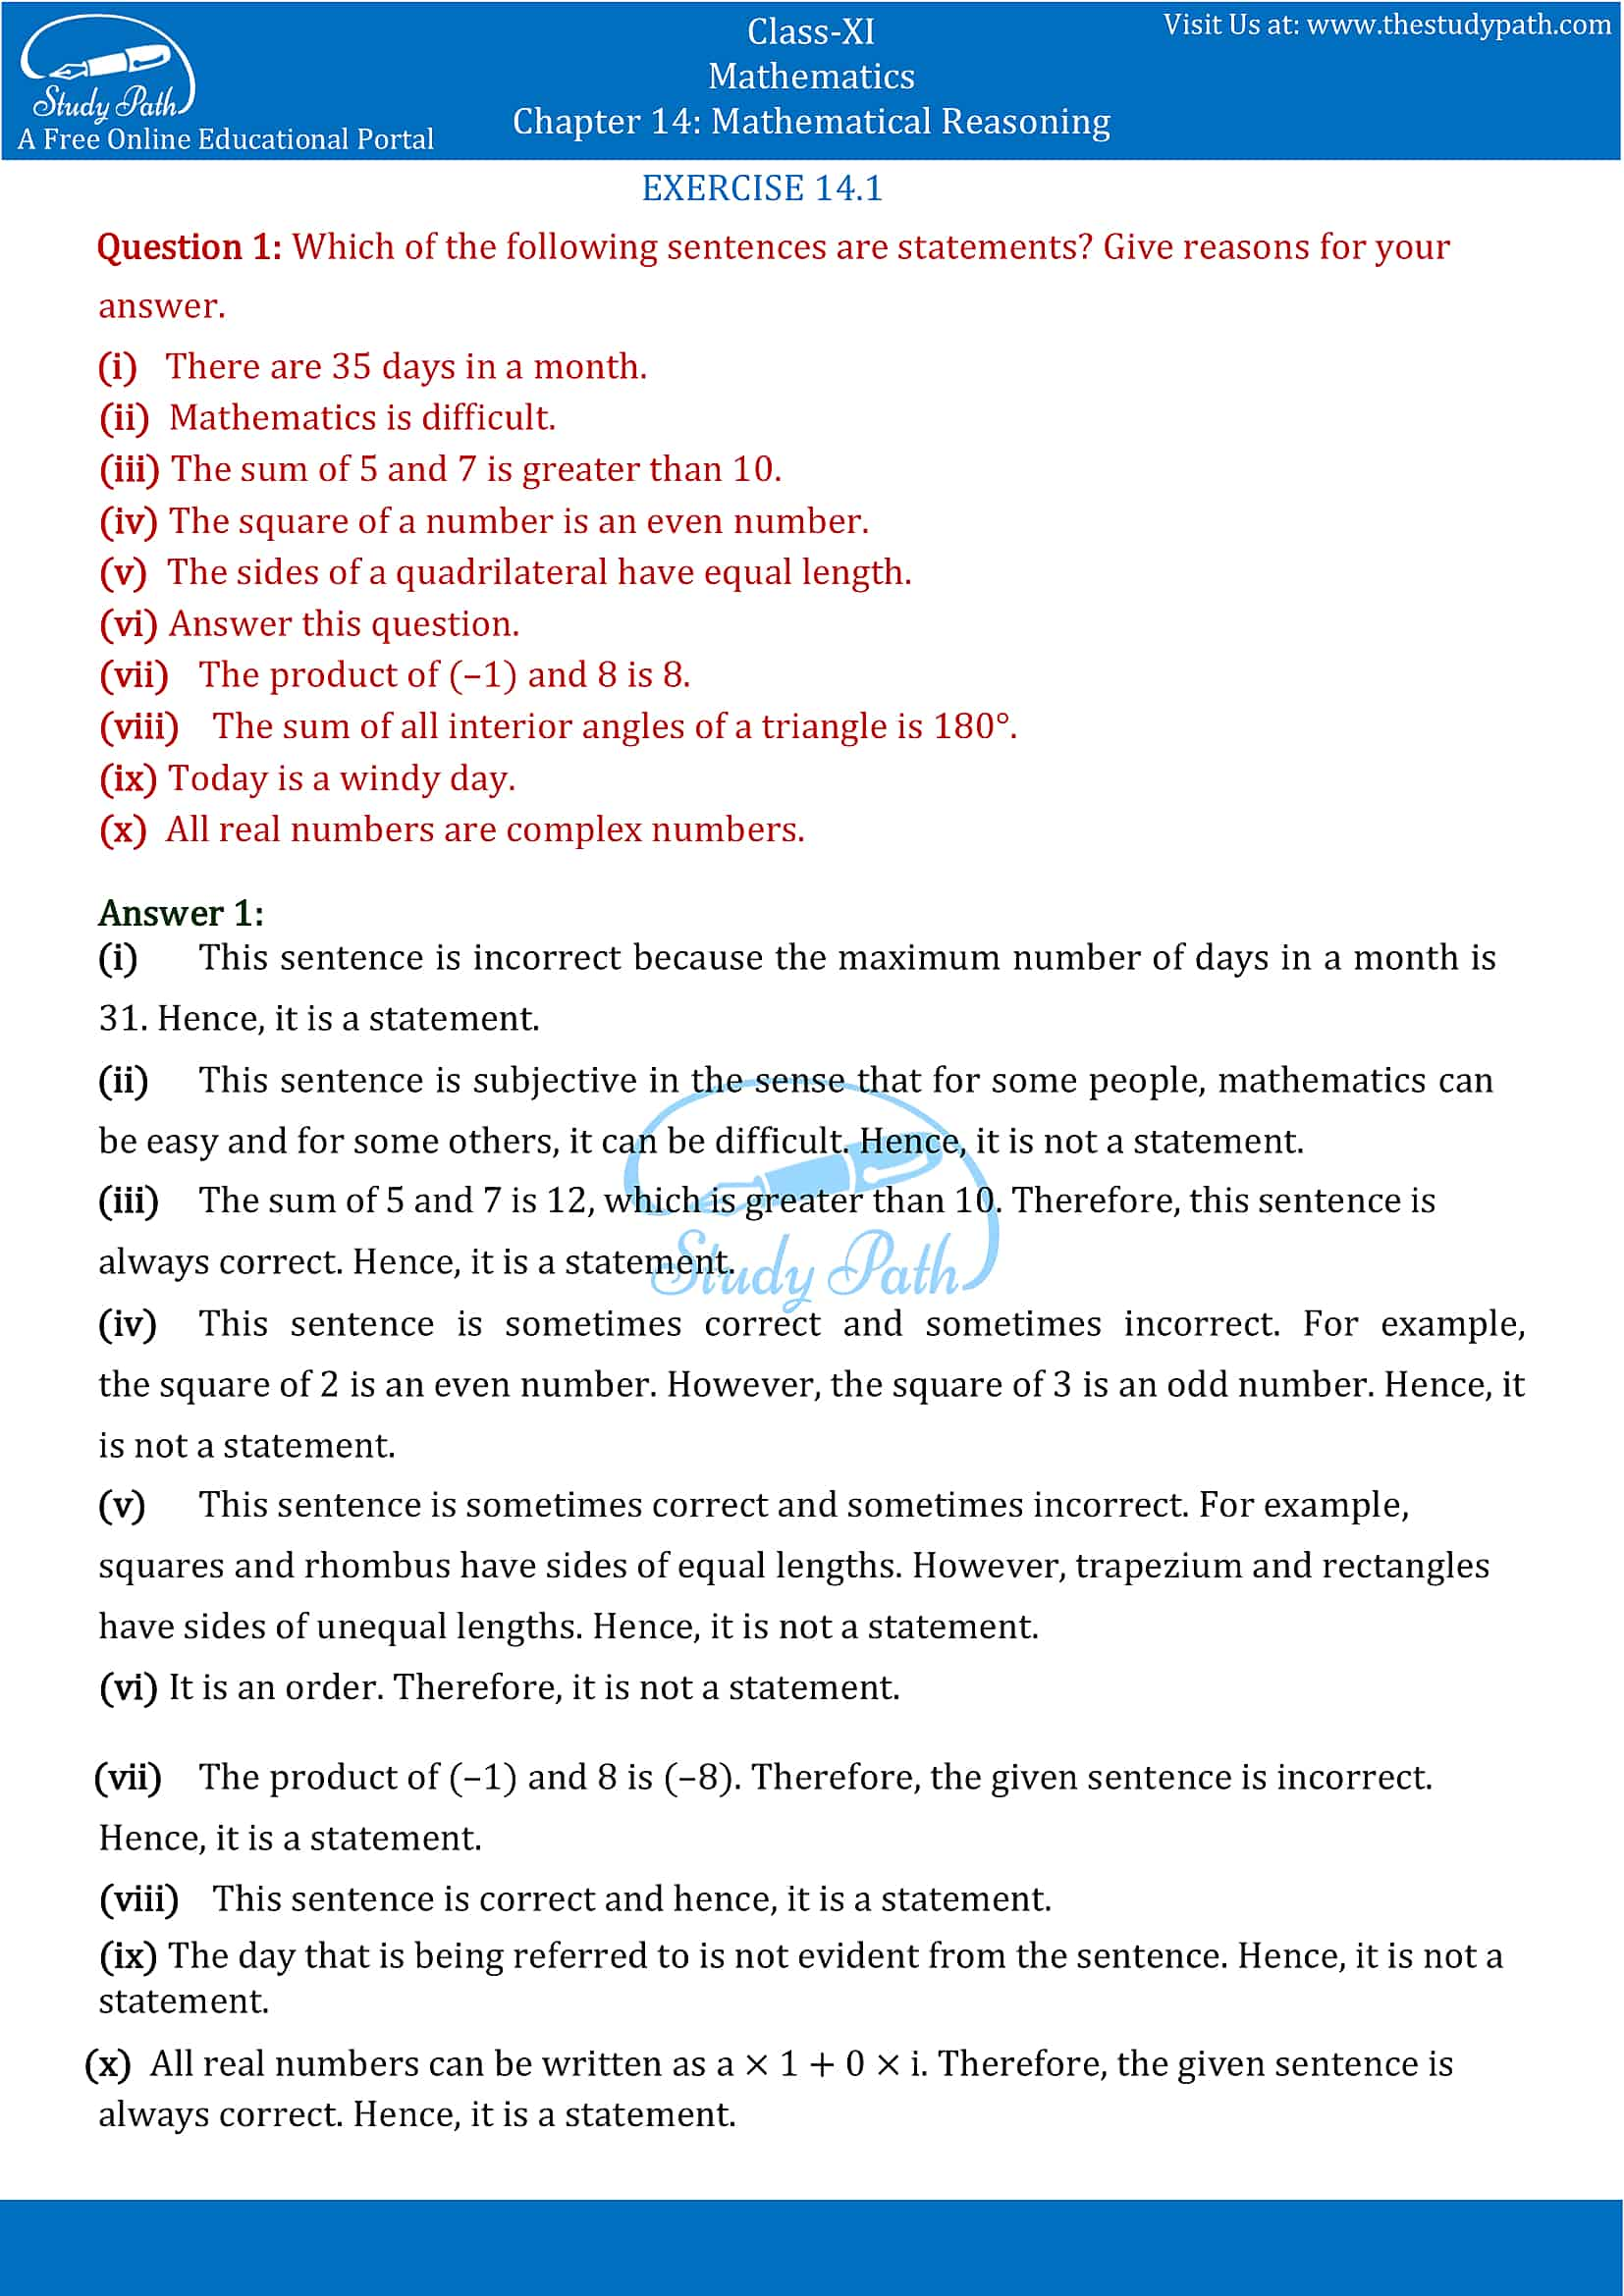 NCERT Solutions for Class 11 Maths chapter 14 Mathematical Reasoning Part 1